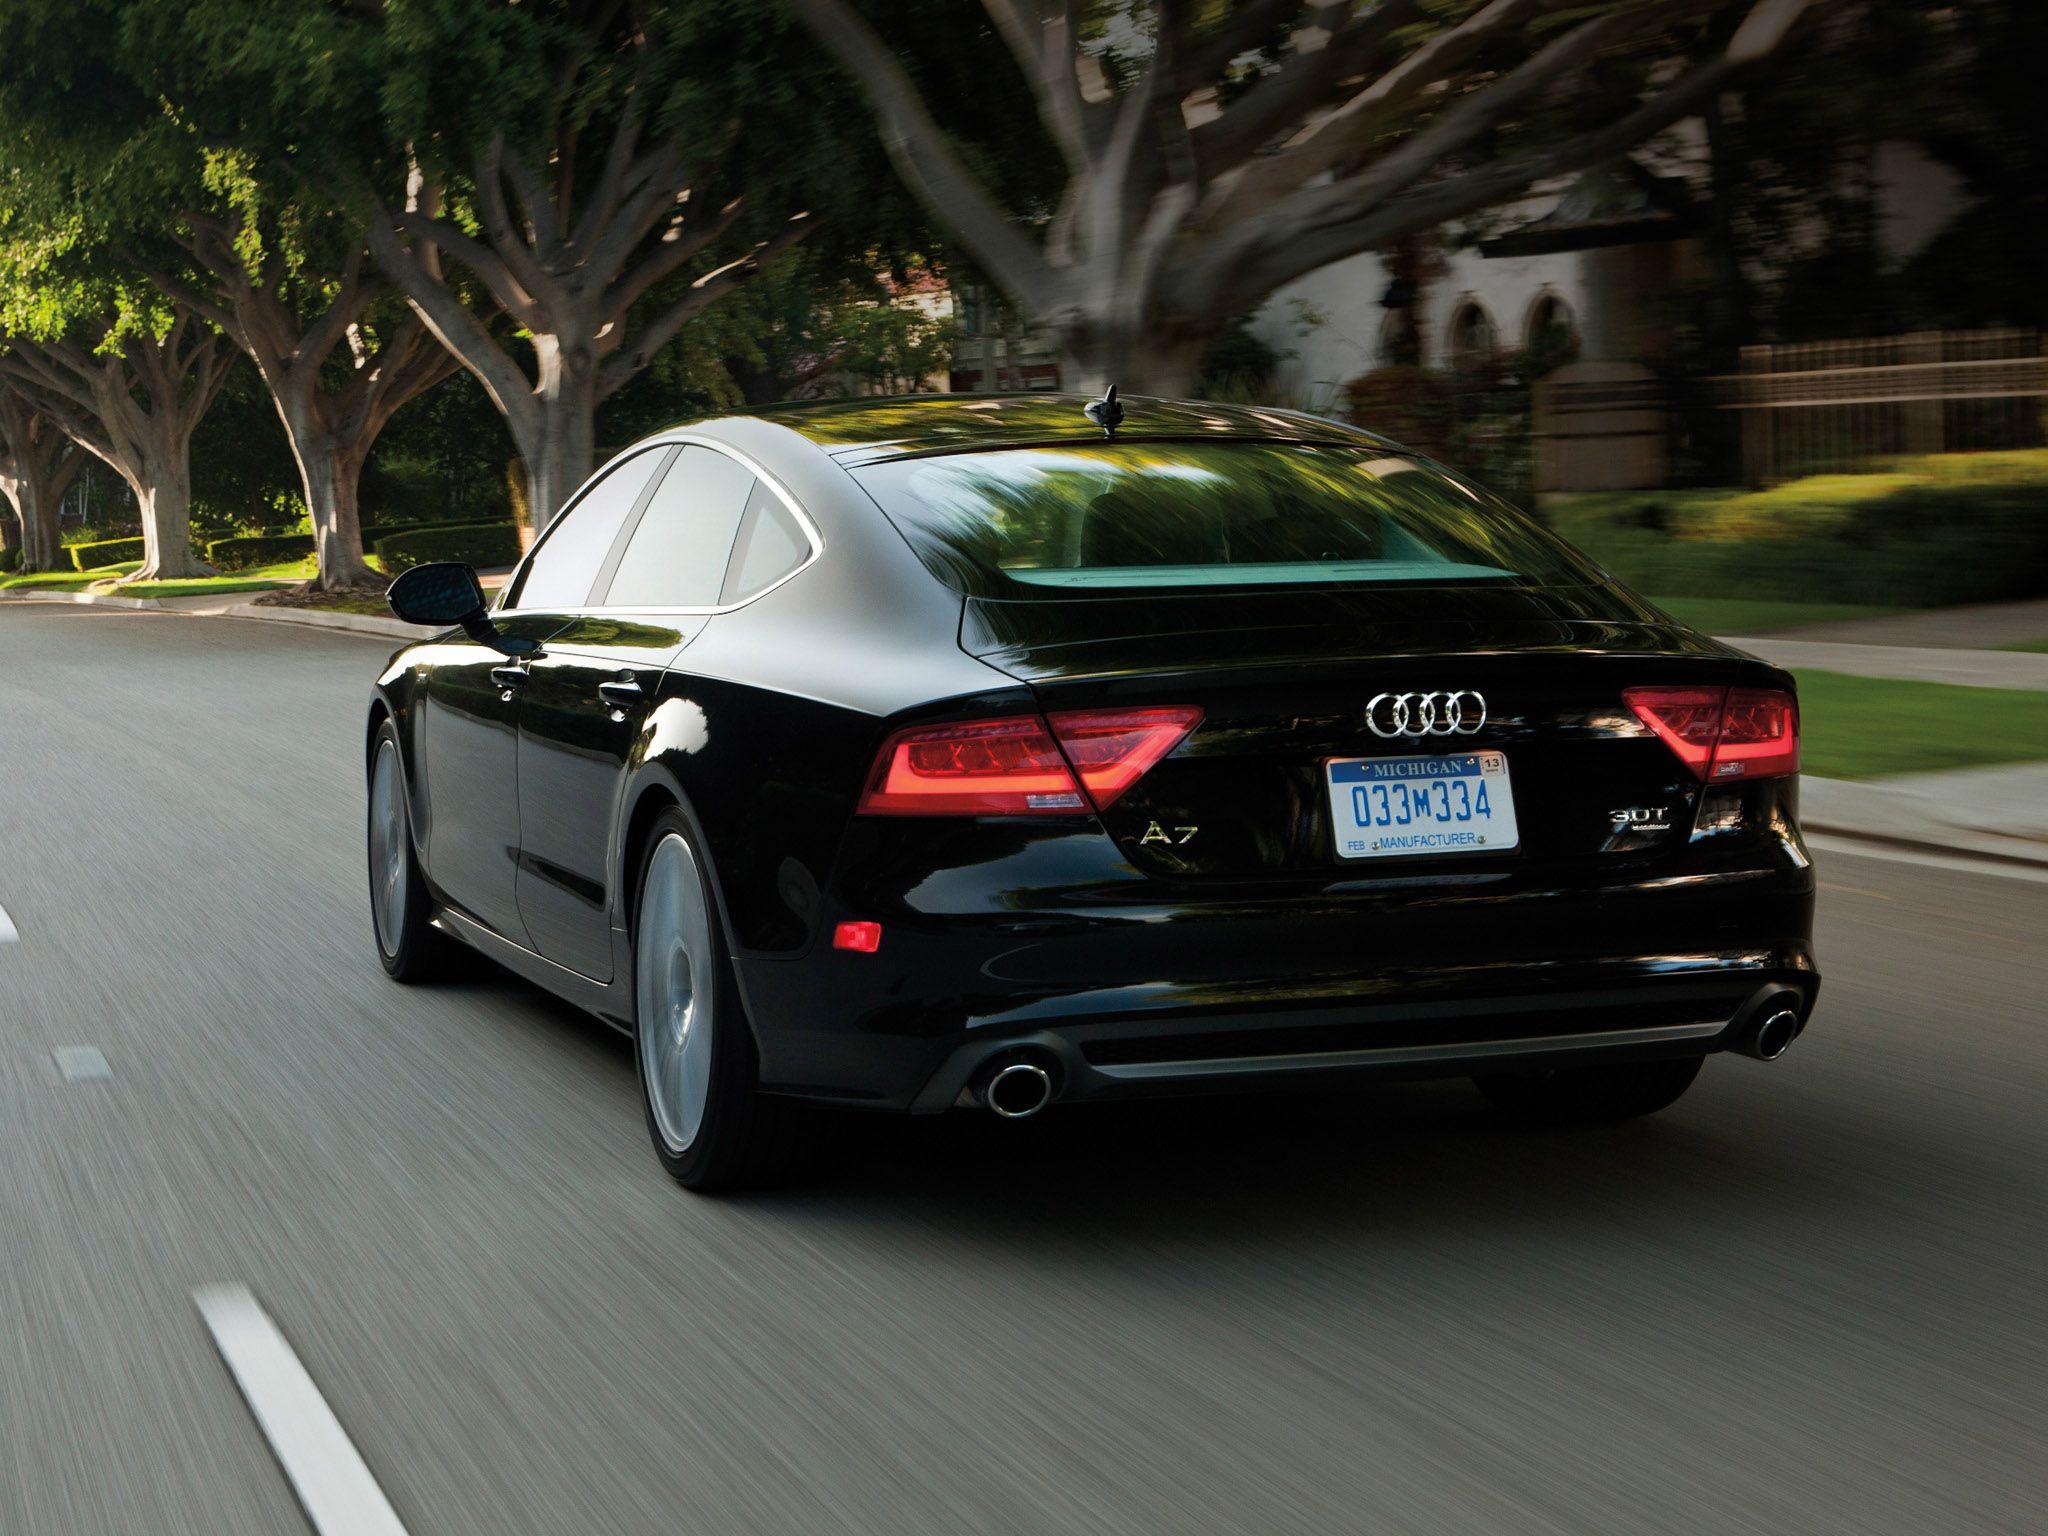 Audi A7 S Line Car Wallpaper HD http